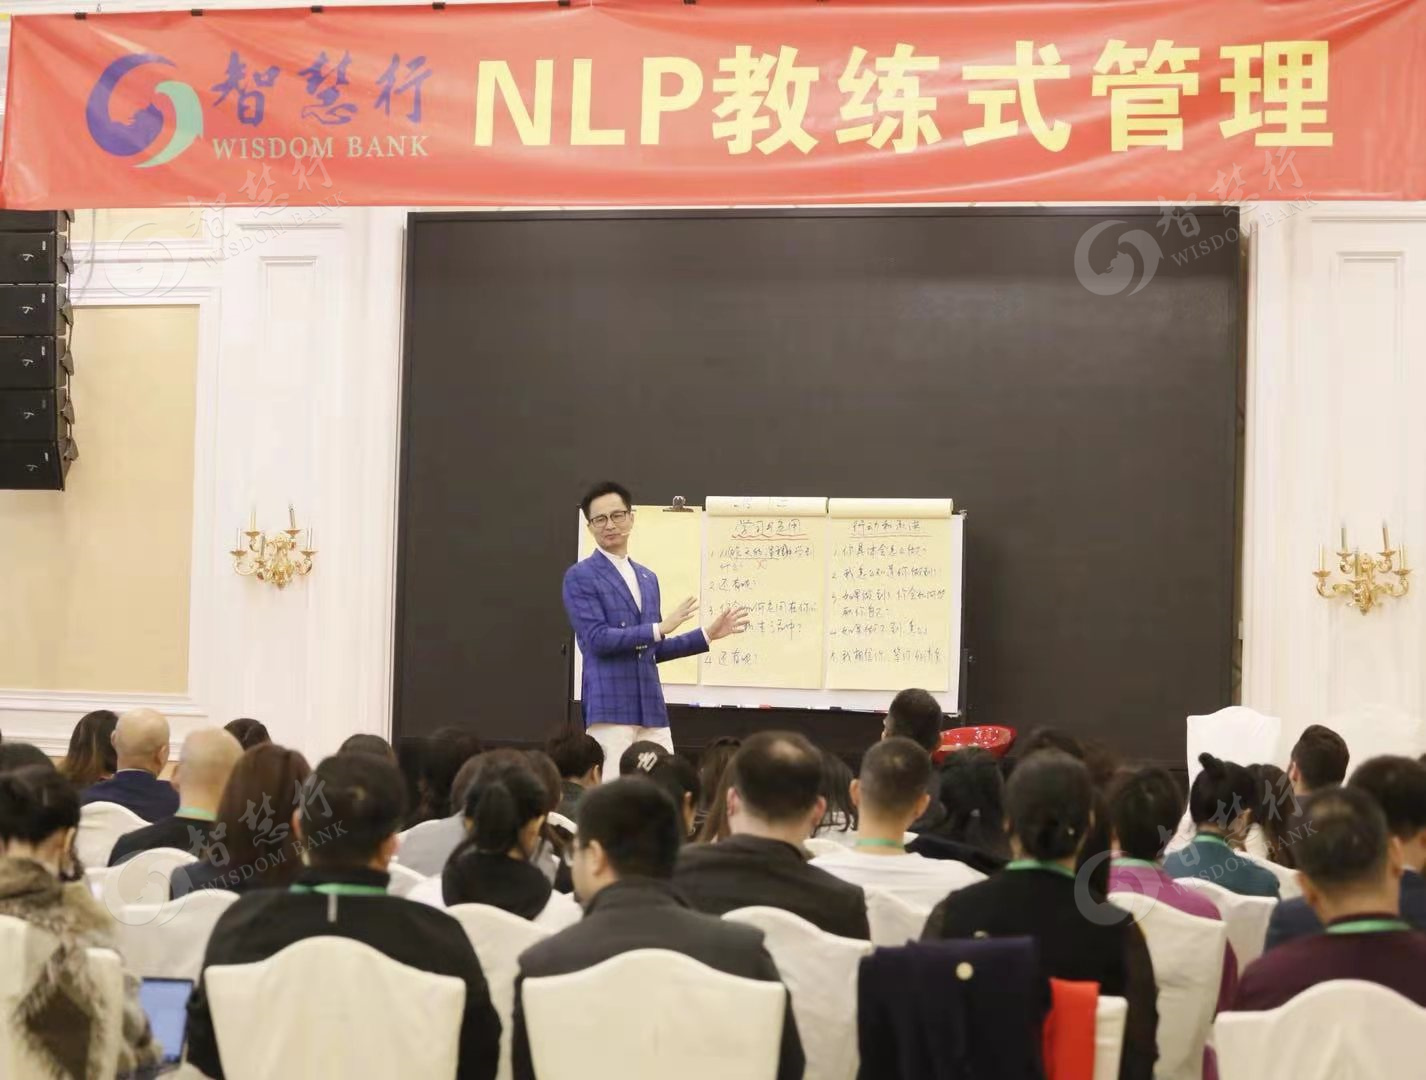 《NLP教练式管理》结课报道:教练,可以唤醒一个人的潜能